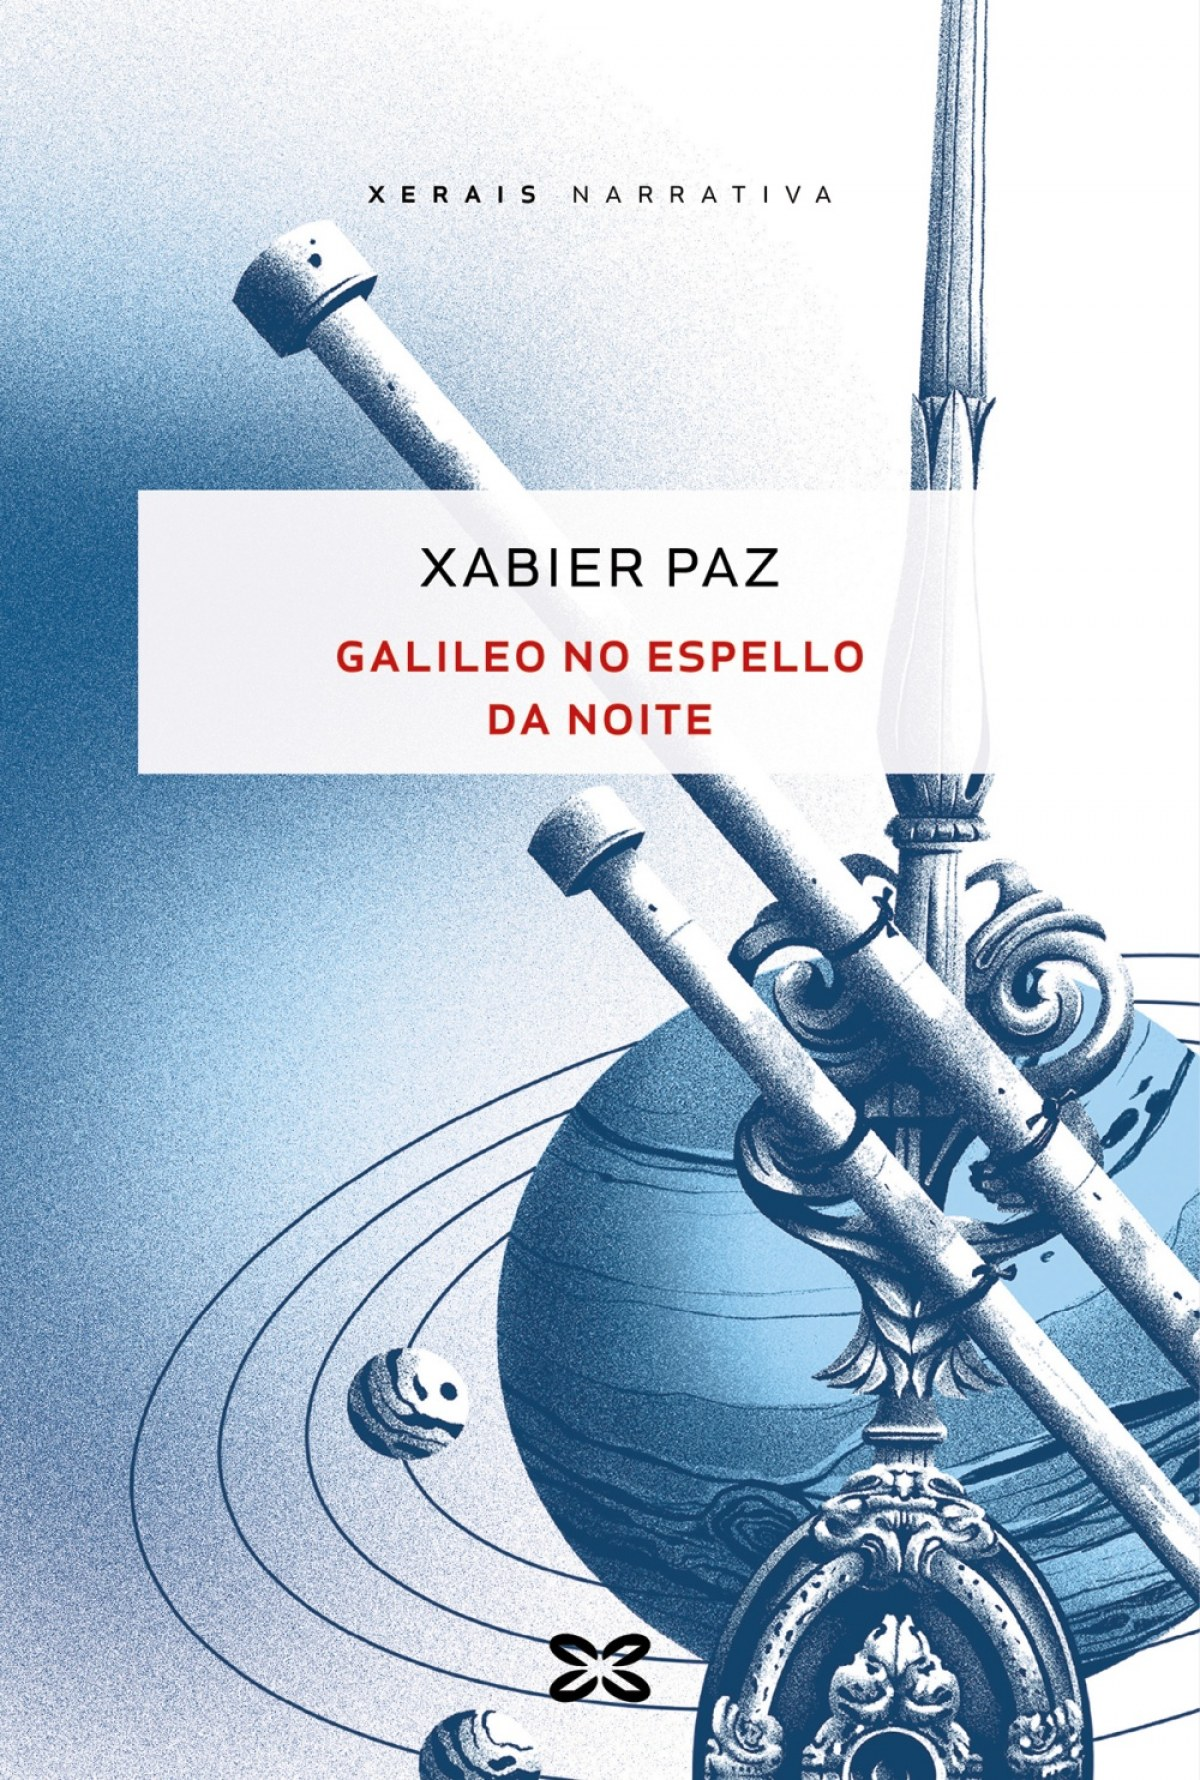 GALIELEO NO ESPELLO DA NOITE